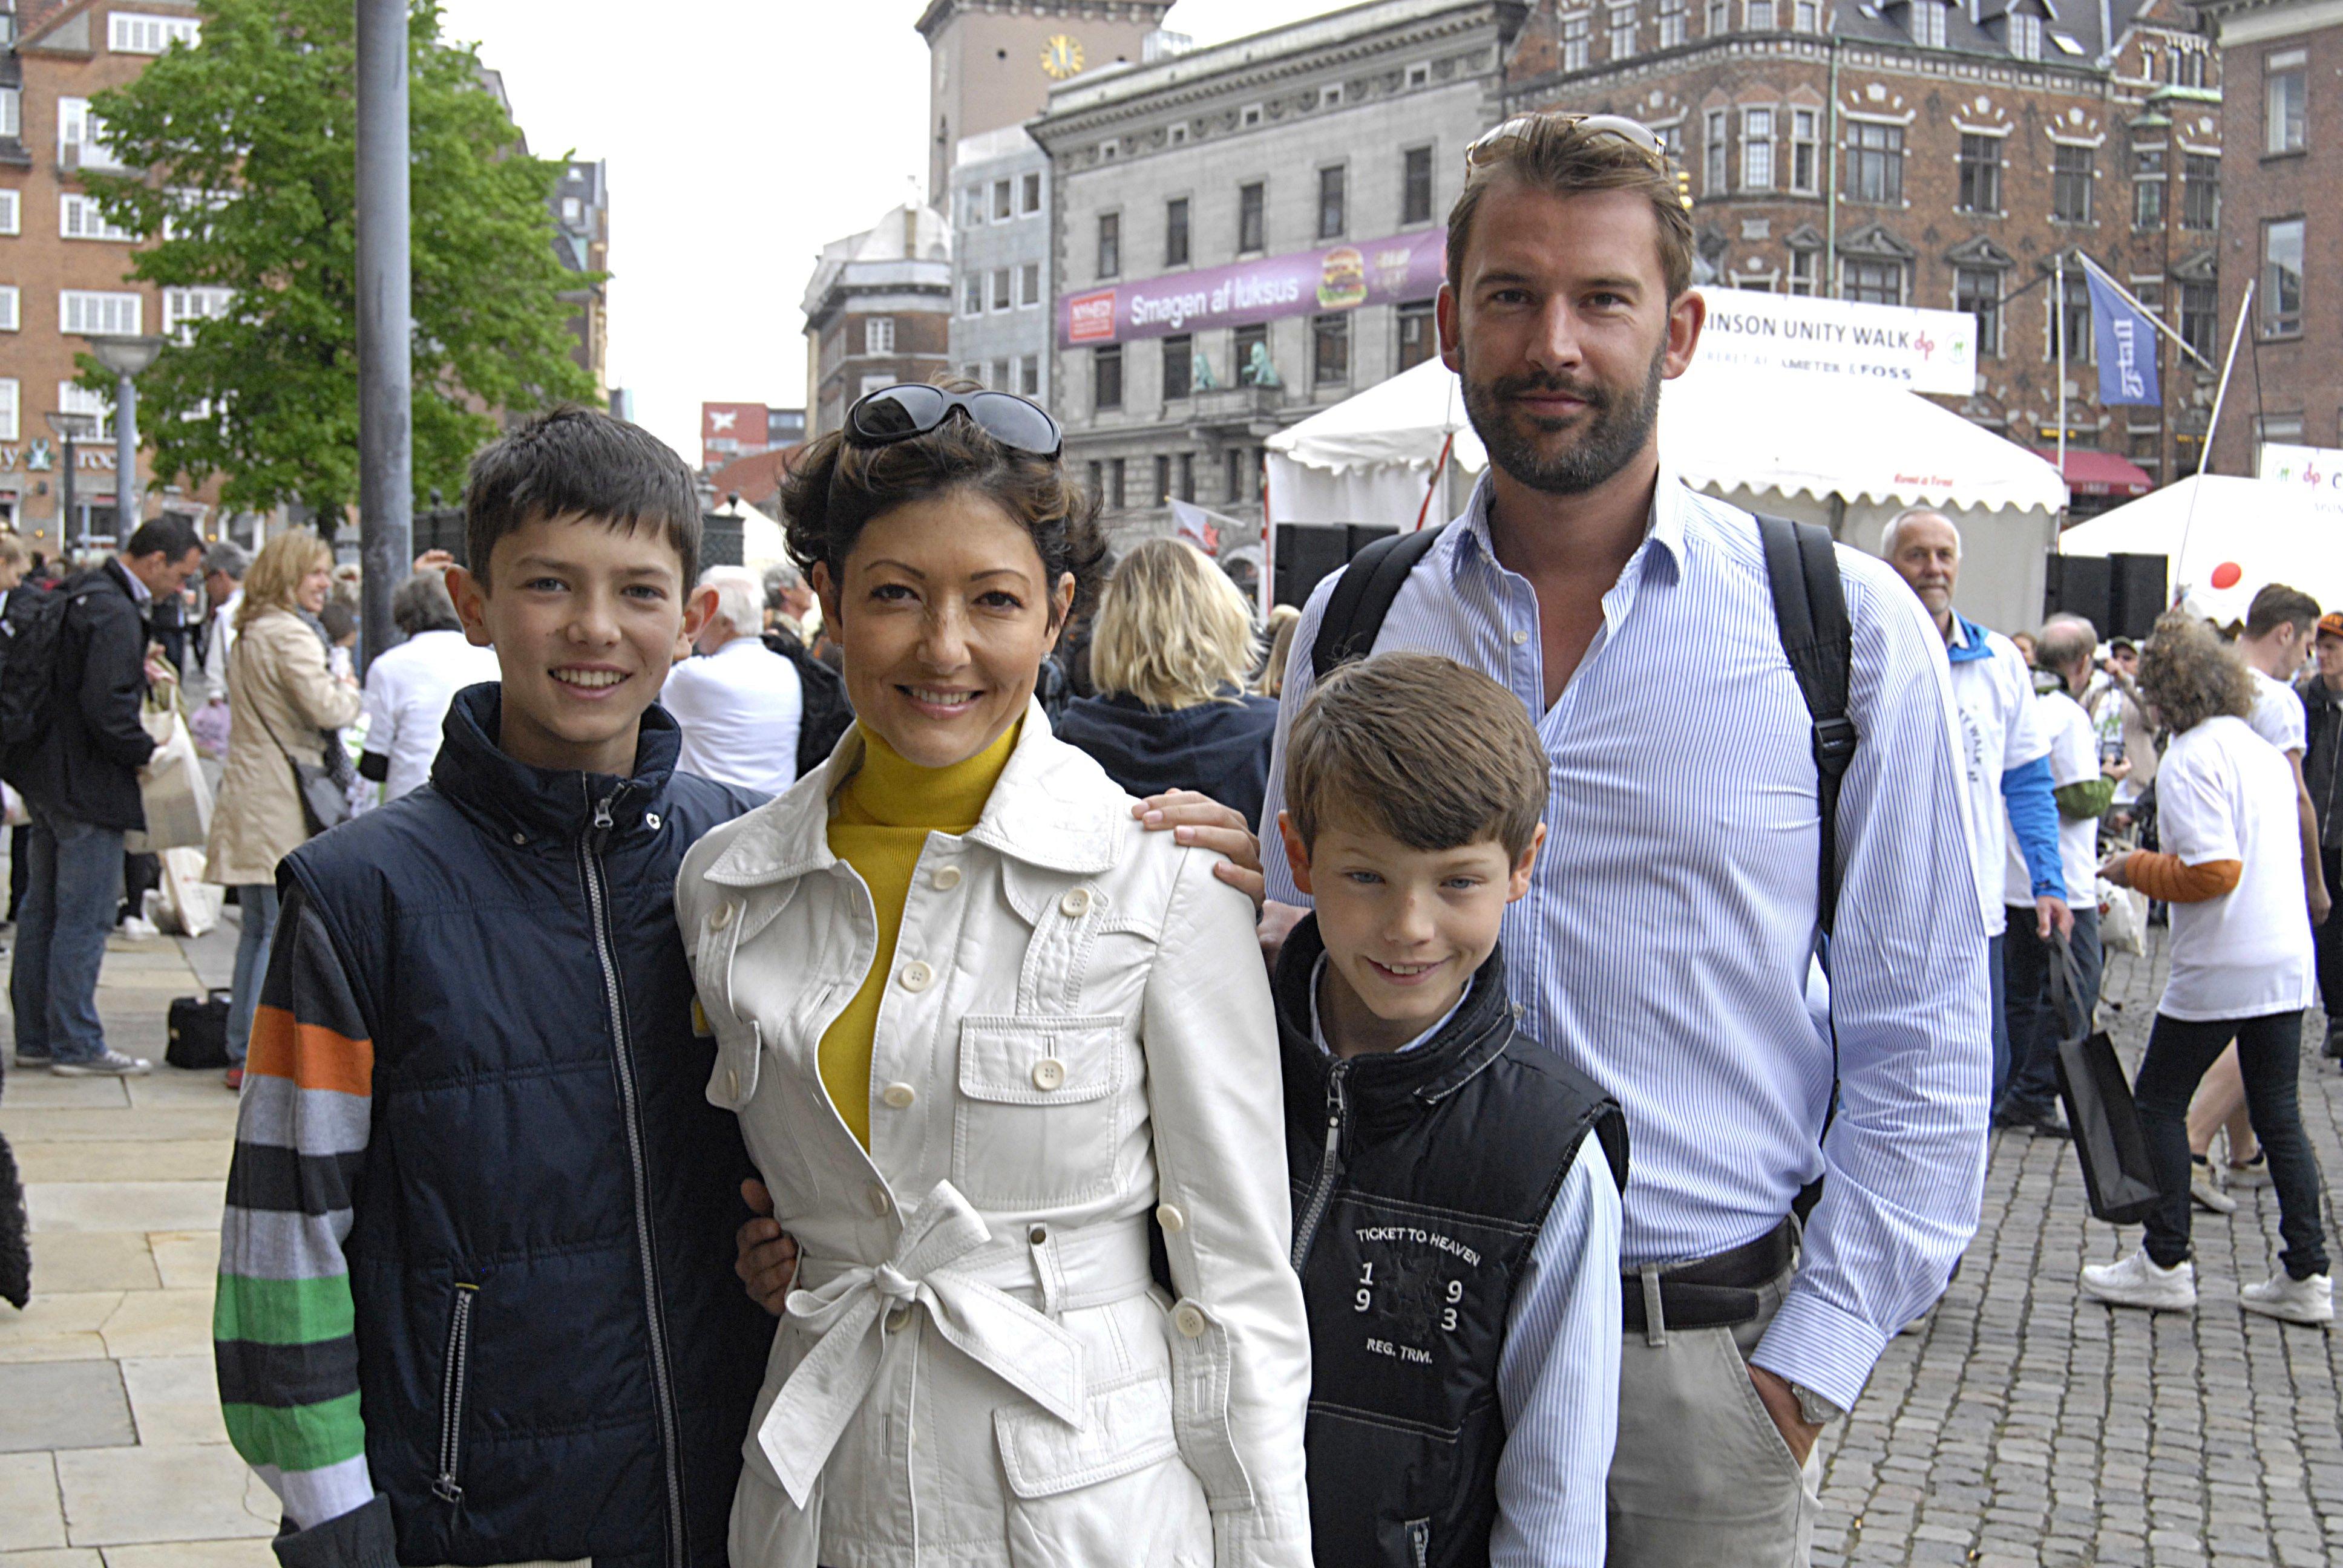 Countess Alexandra of Frederiskborg,prince Nikolai prince felix and Martin Jorgensen parkinson unity